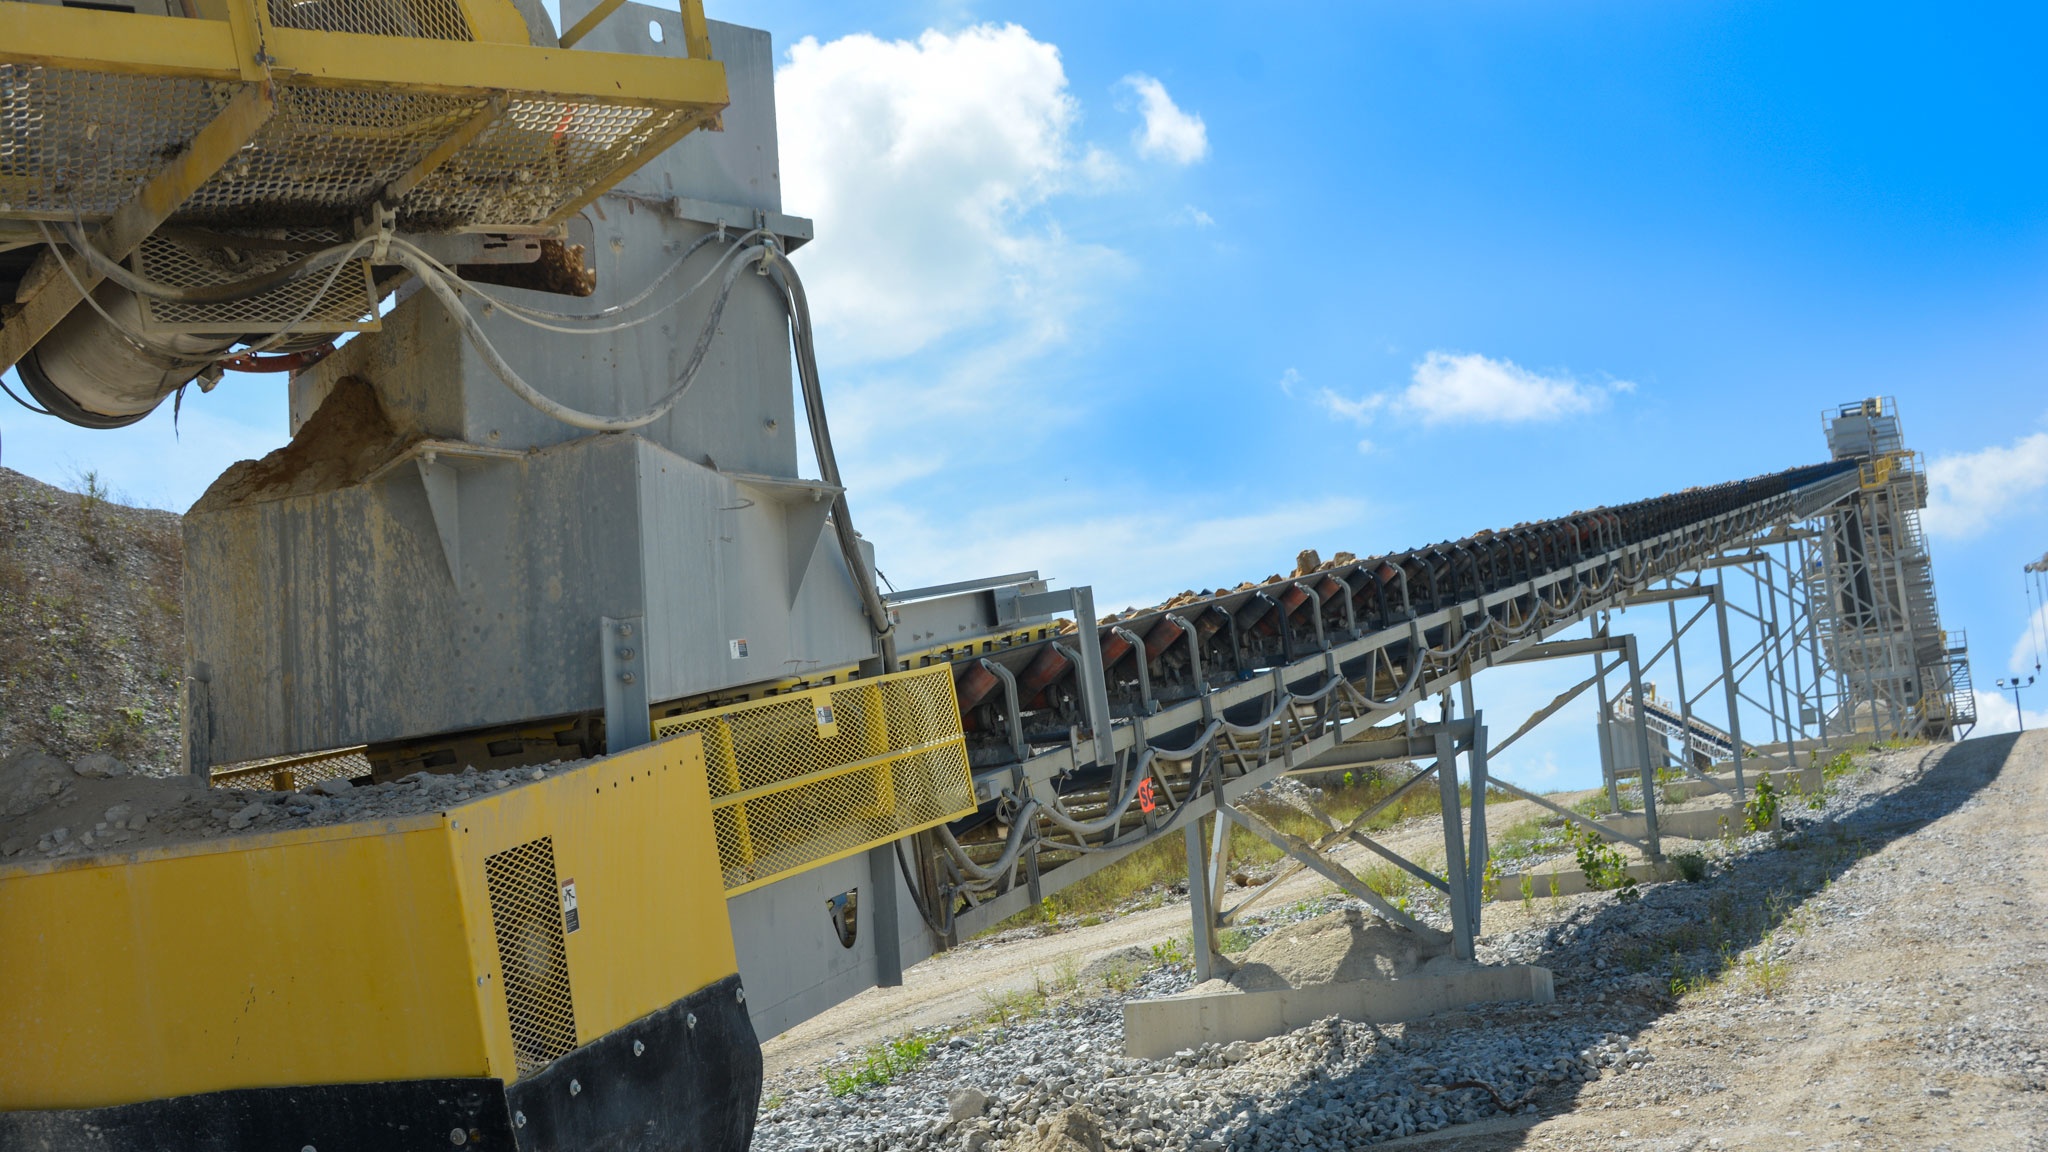 Delphi conveyor